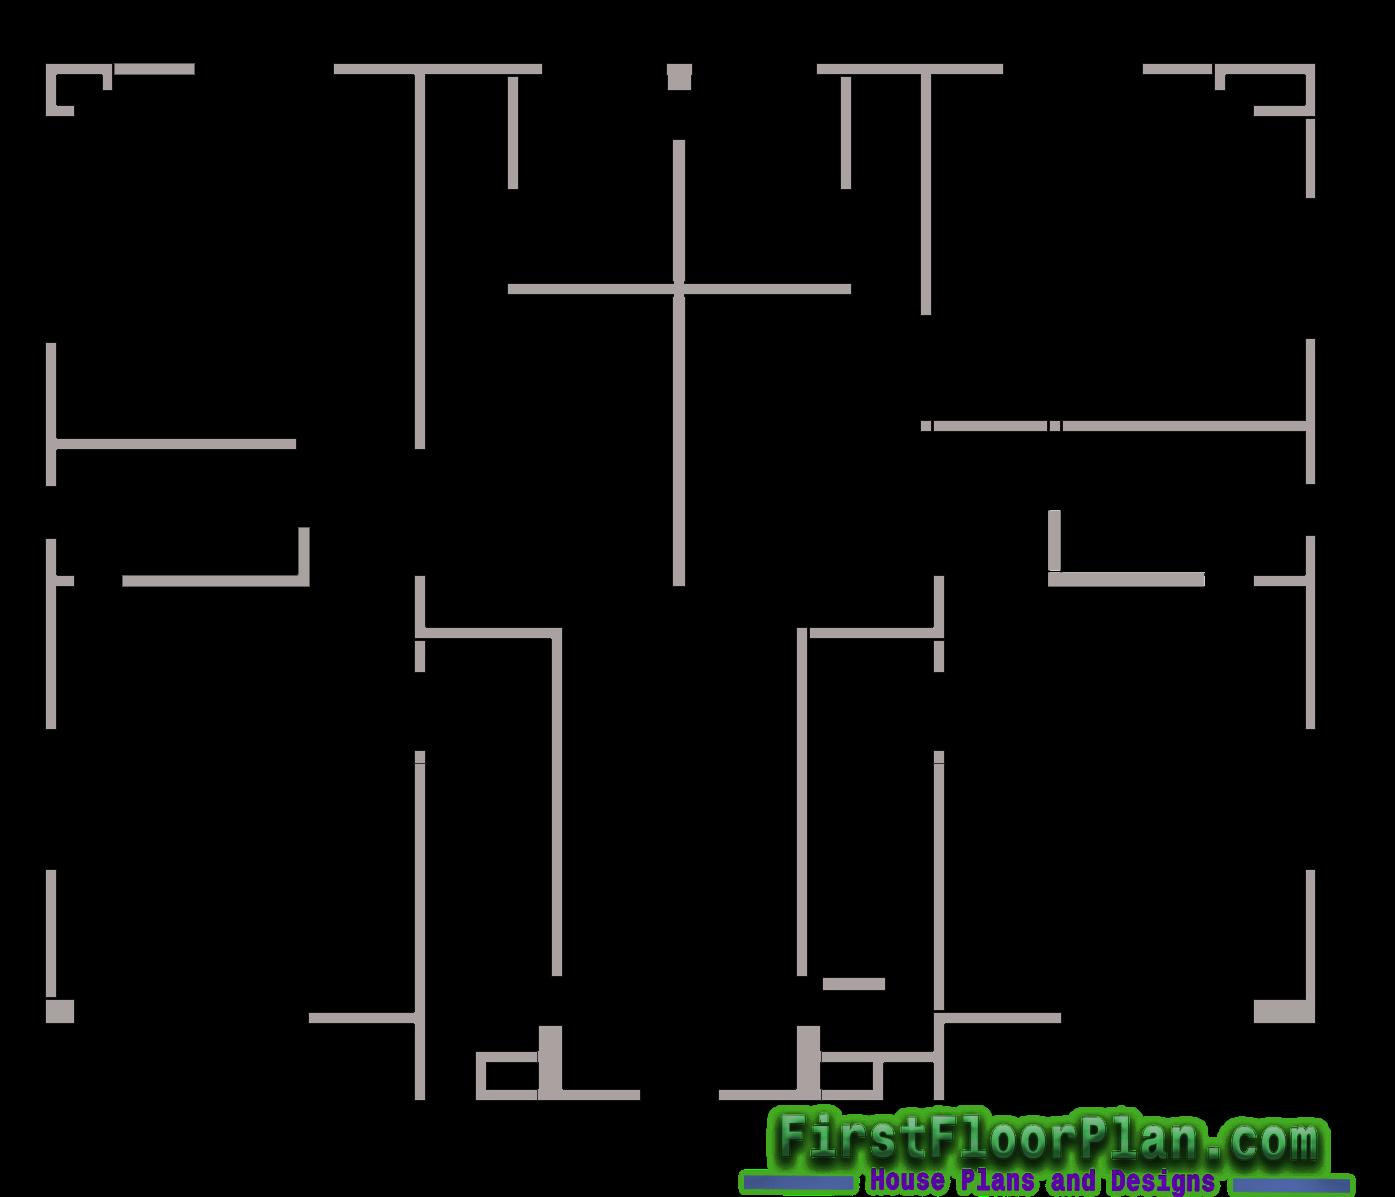 4 floors building plans typical floor plans